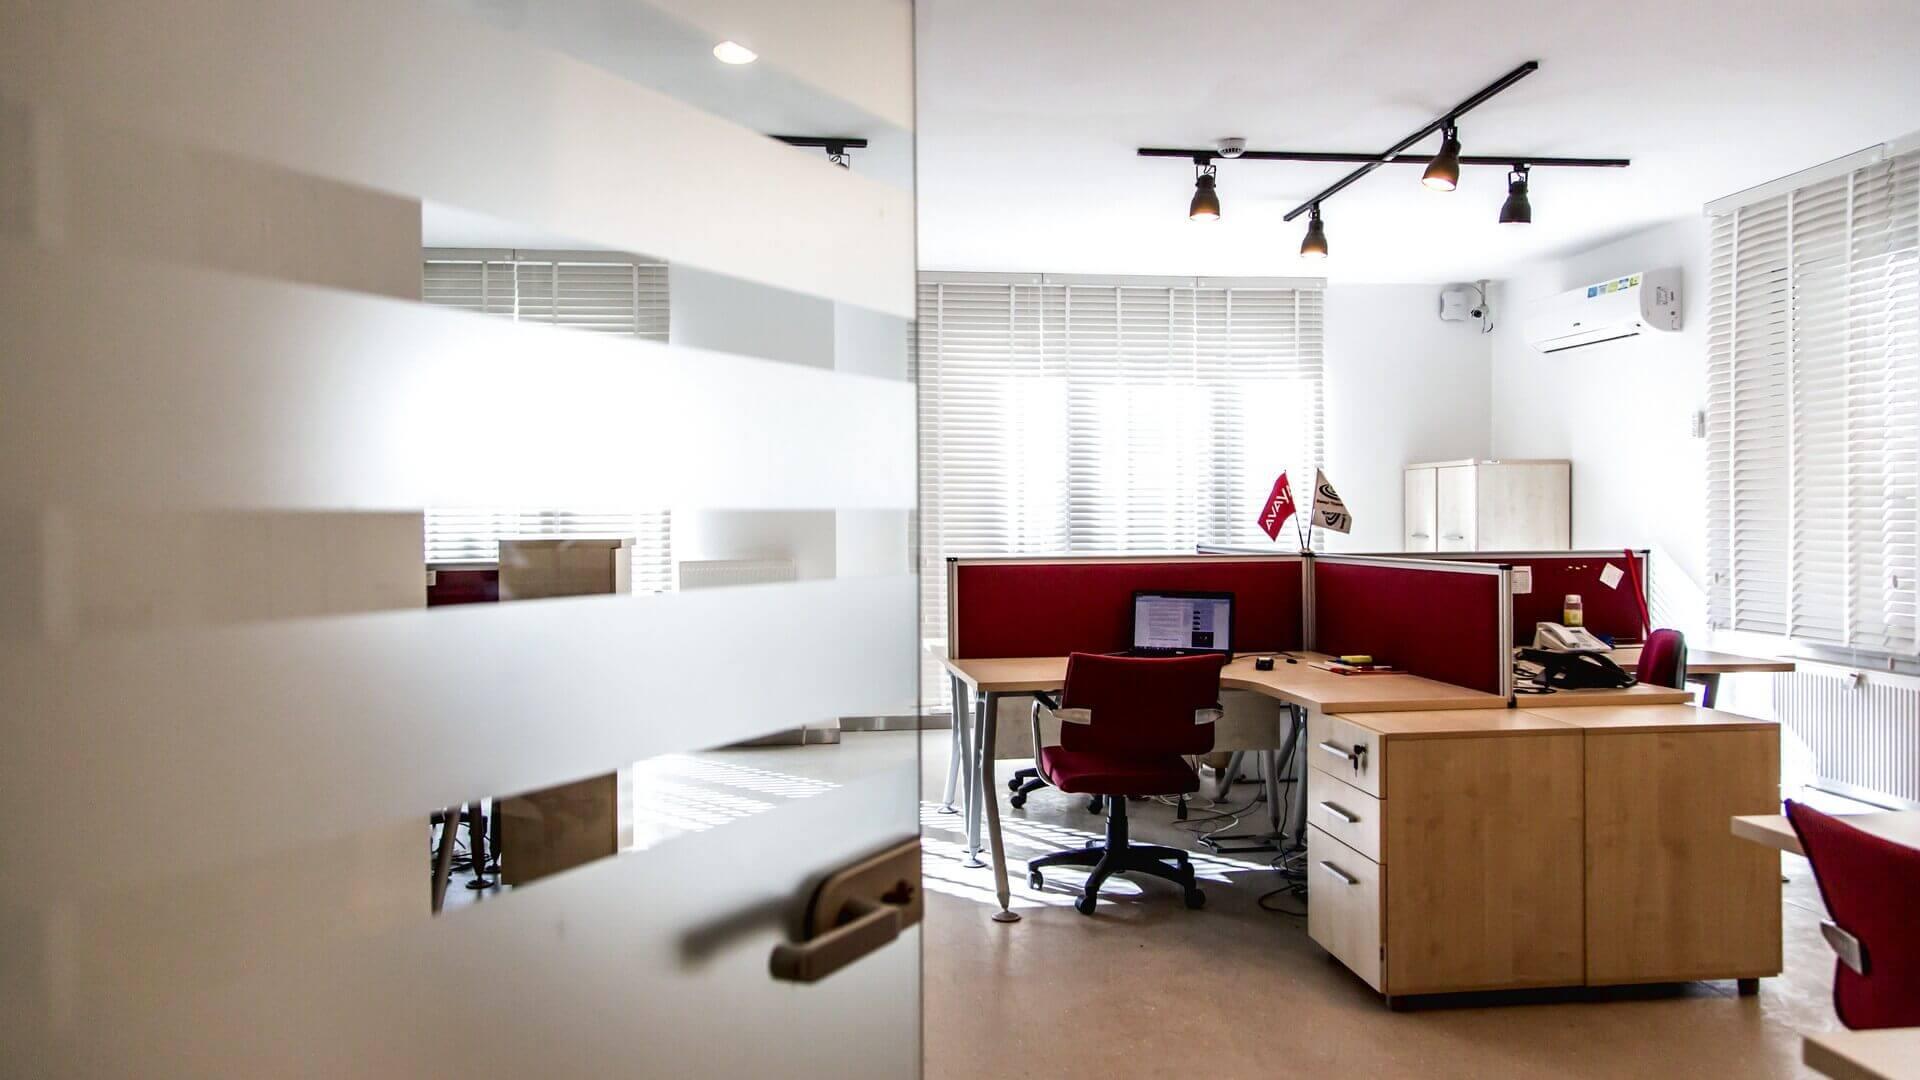 Ümitköy 2647 Net Iletisim Office Building Offices